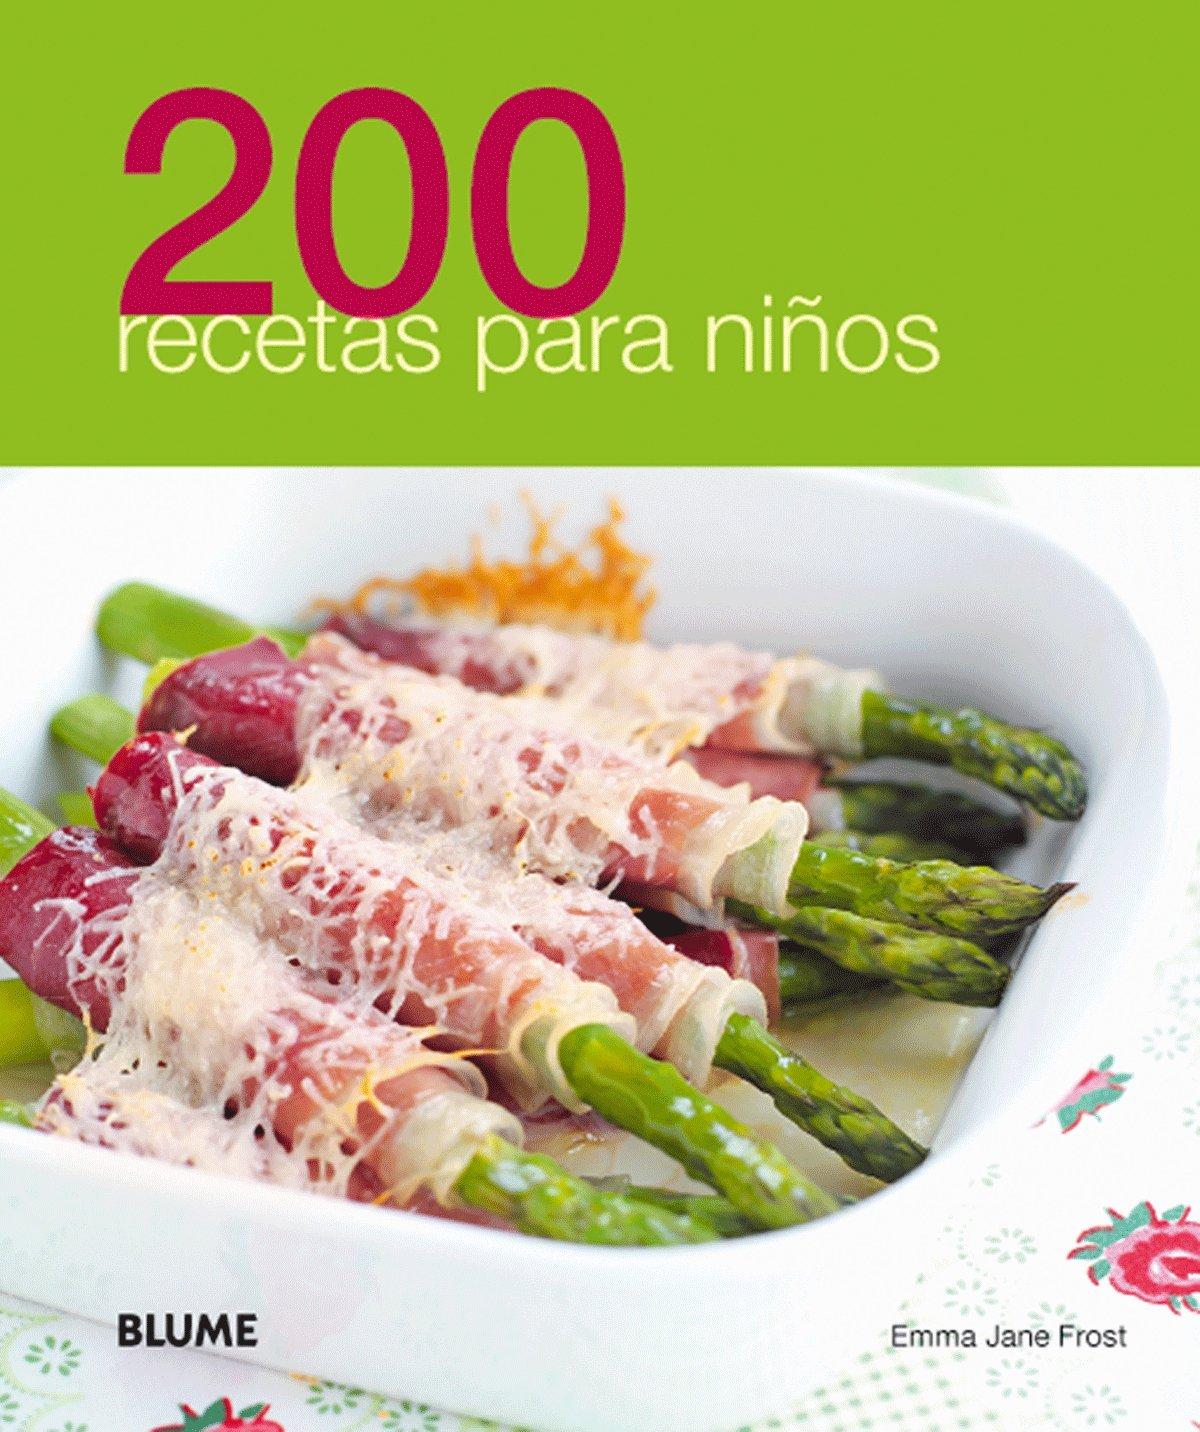 200 recetas para ninos (Spanish Edition): Emma Jane Frost: 9788480769556:  Amazon.com: Books